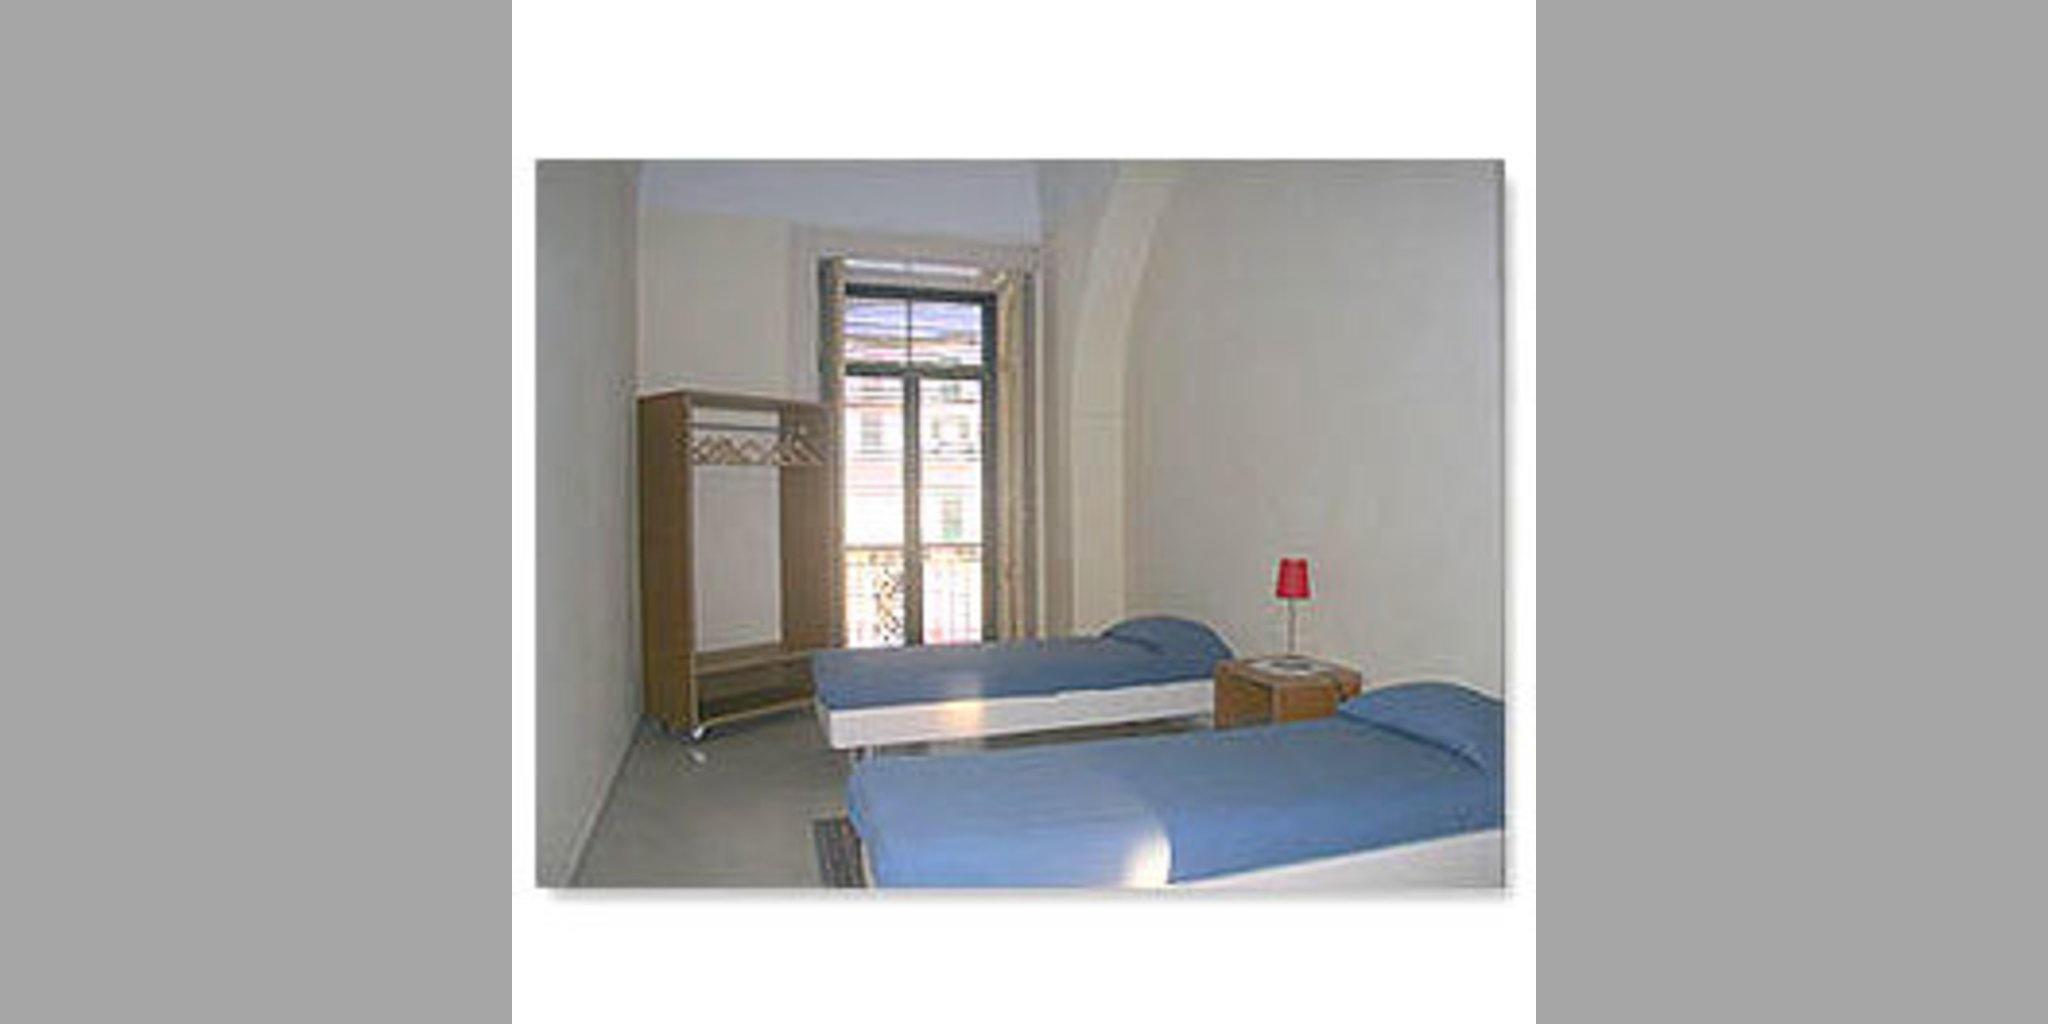 Bed & Breakfast Torre Annunziata - Oplonti